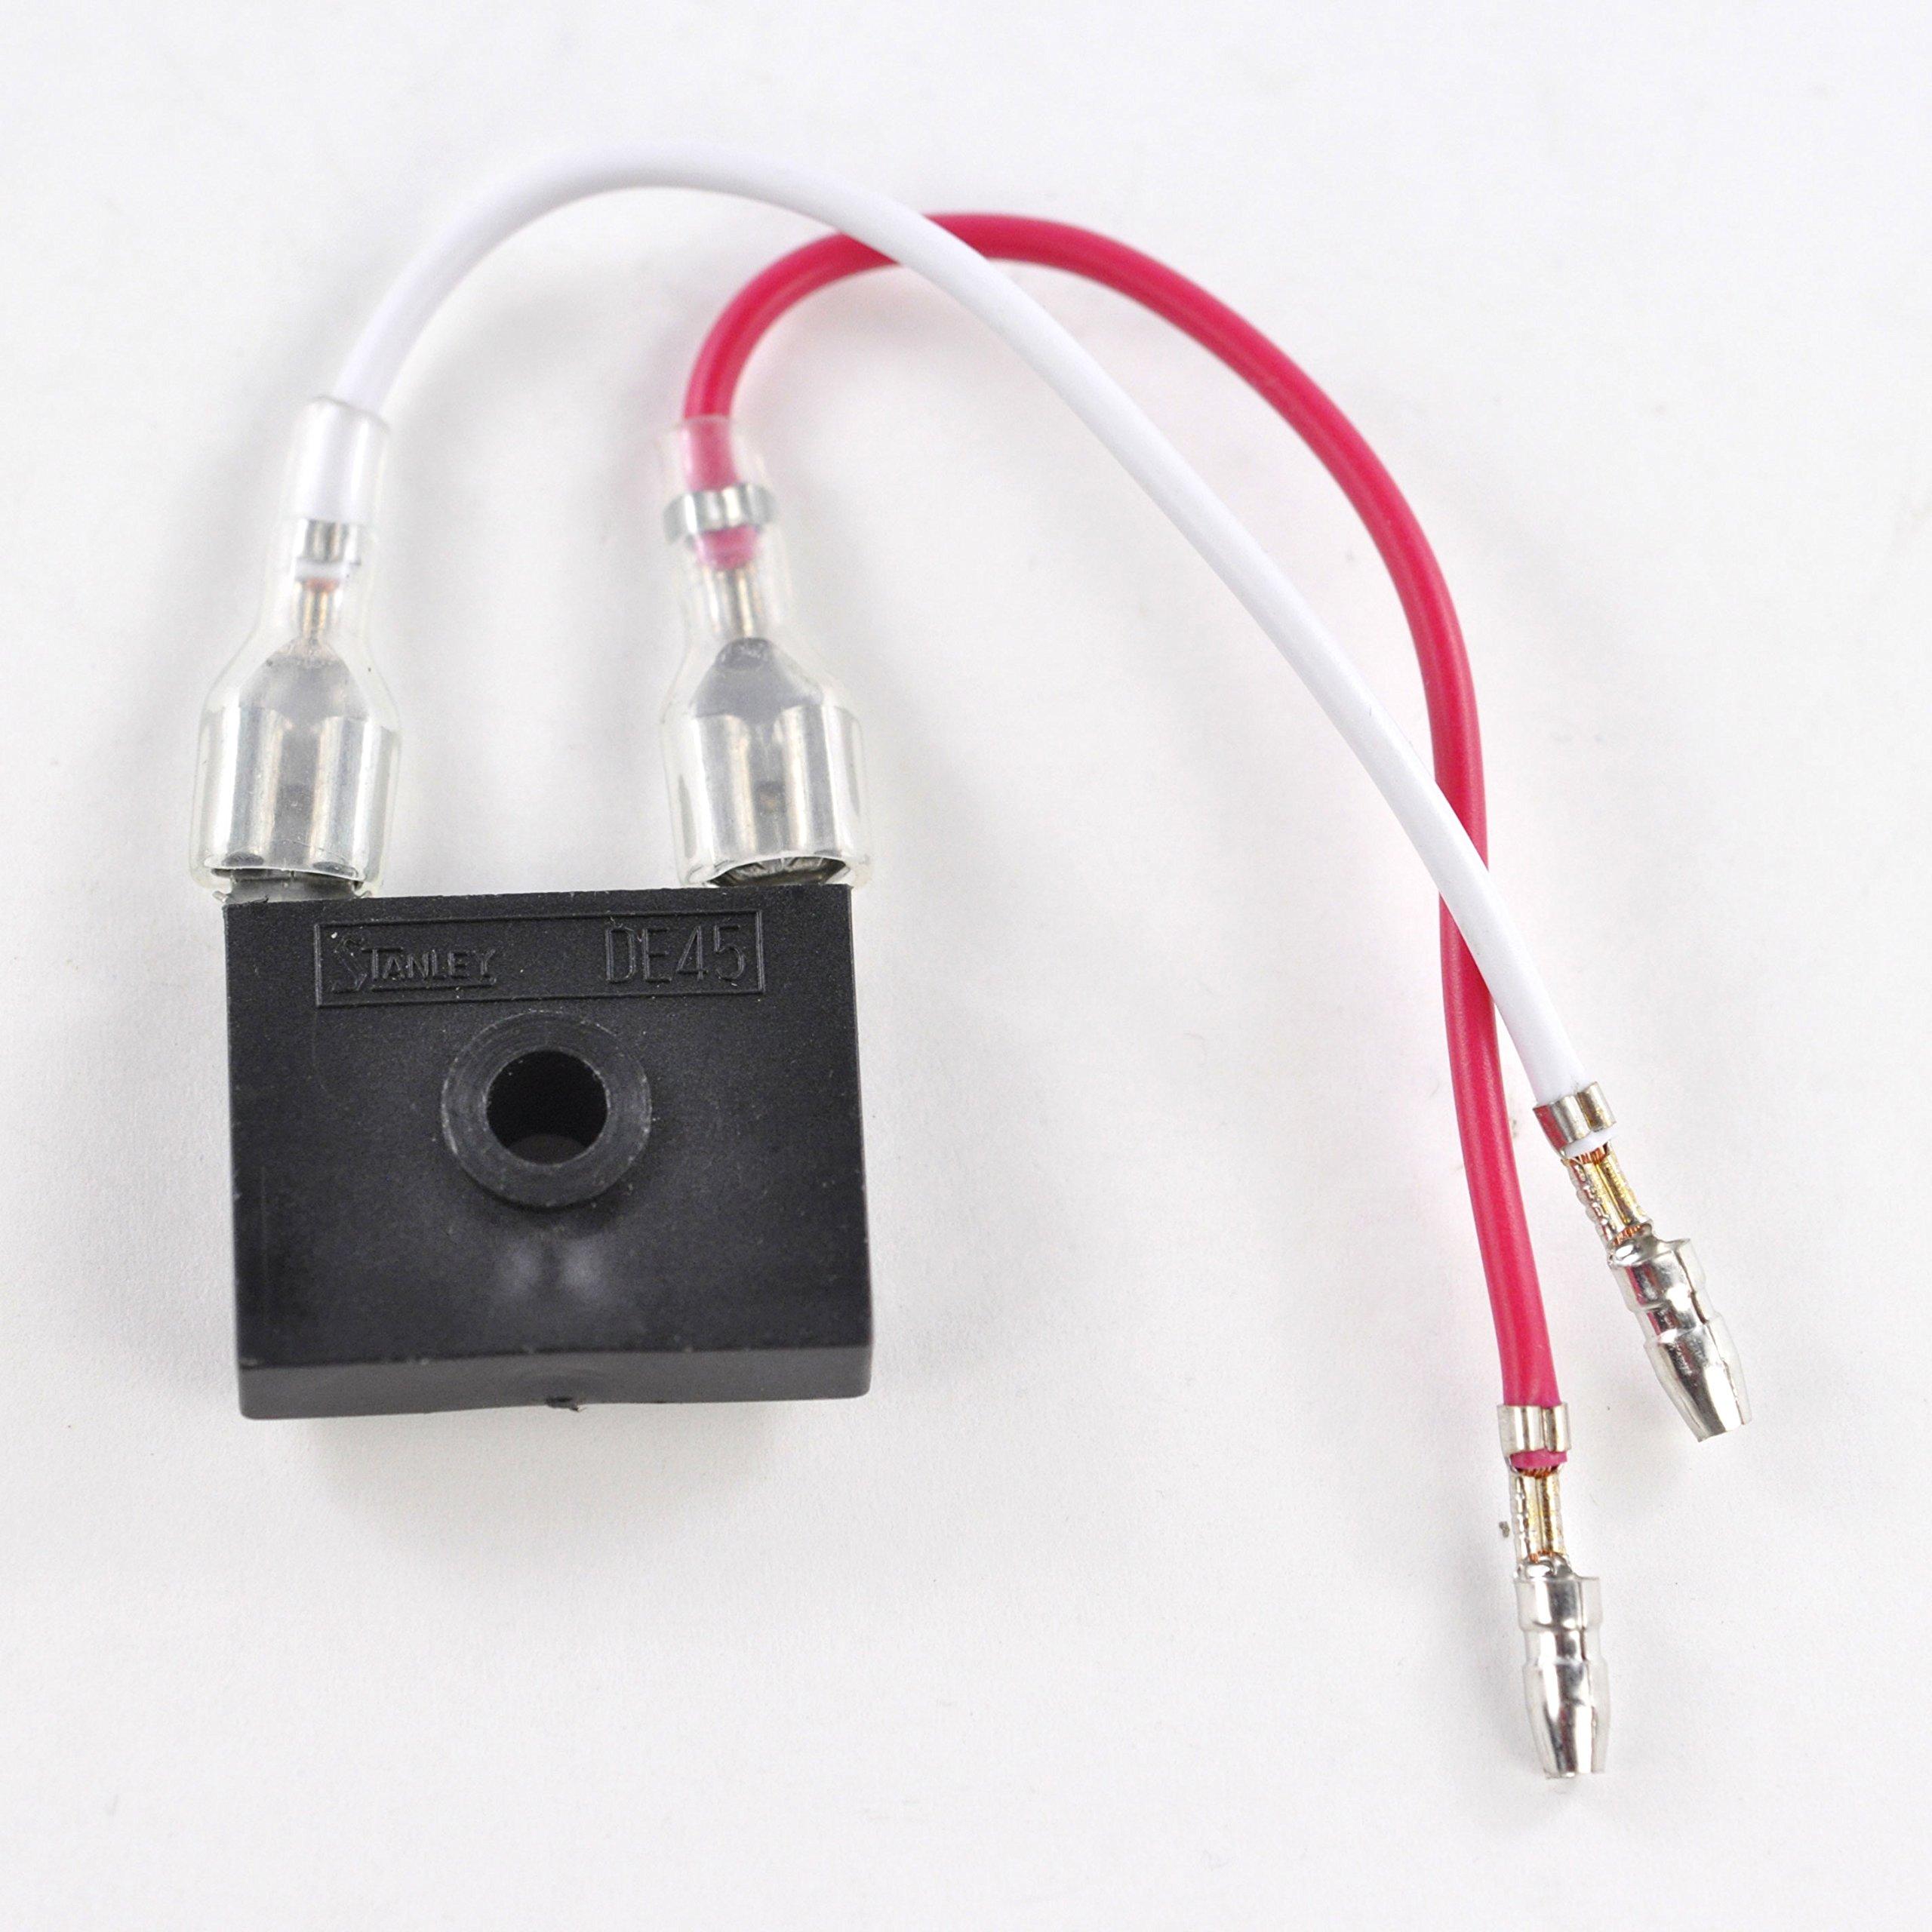 AC/DC Regulator For Yamaha DT1 Enduro 250 1974 XT 500 1976 1977 1978 1979 1980 1981 OEM Repl.# 353-81970-50-50 353-81970-62-00 353-81970-63-00 353-81970-M0-00